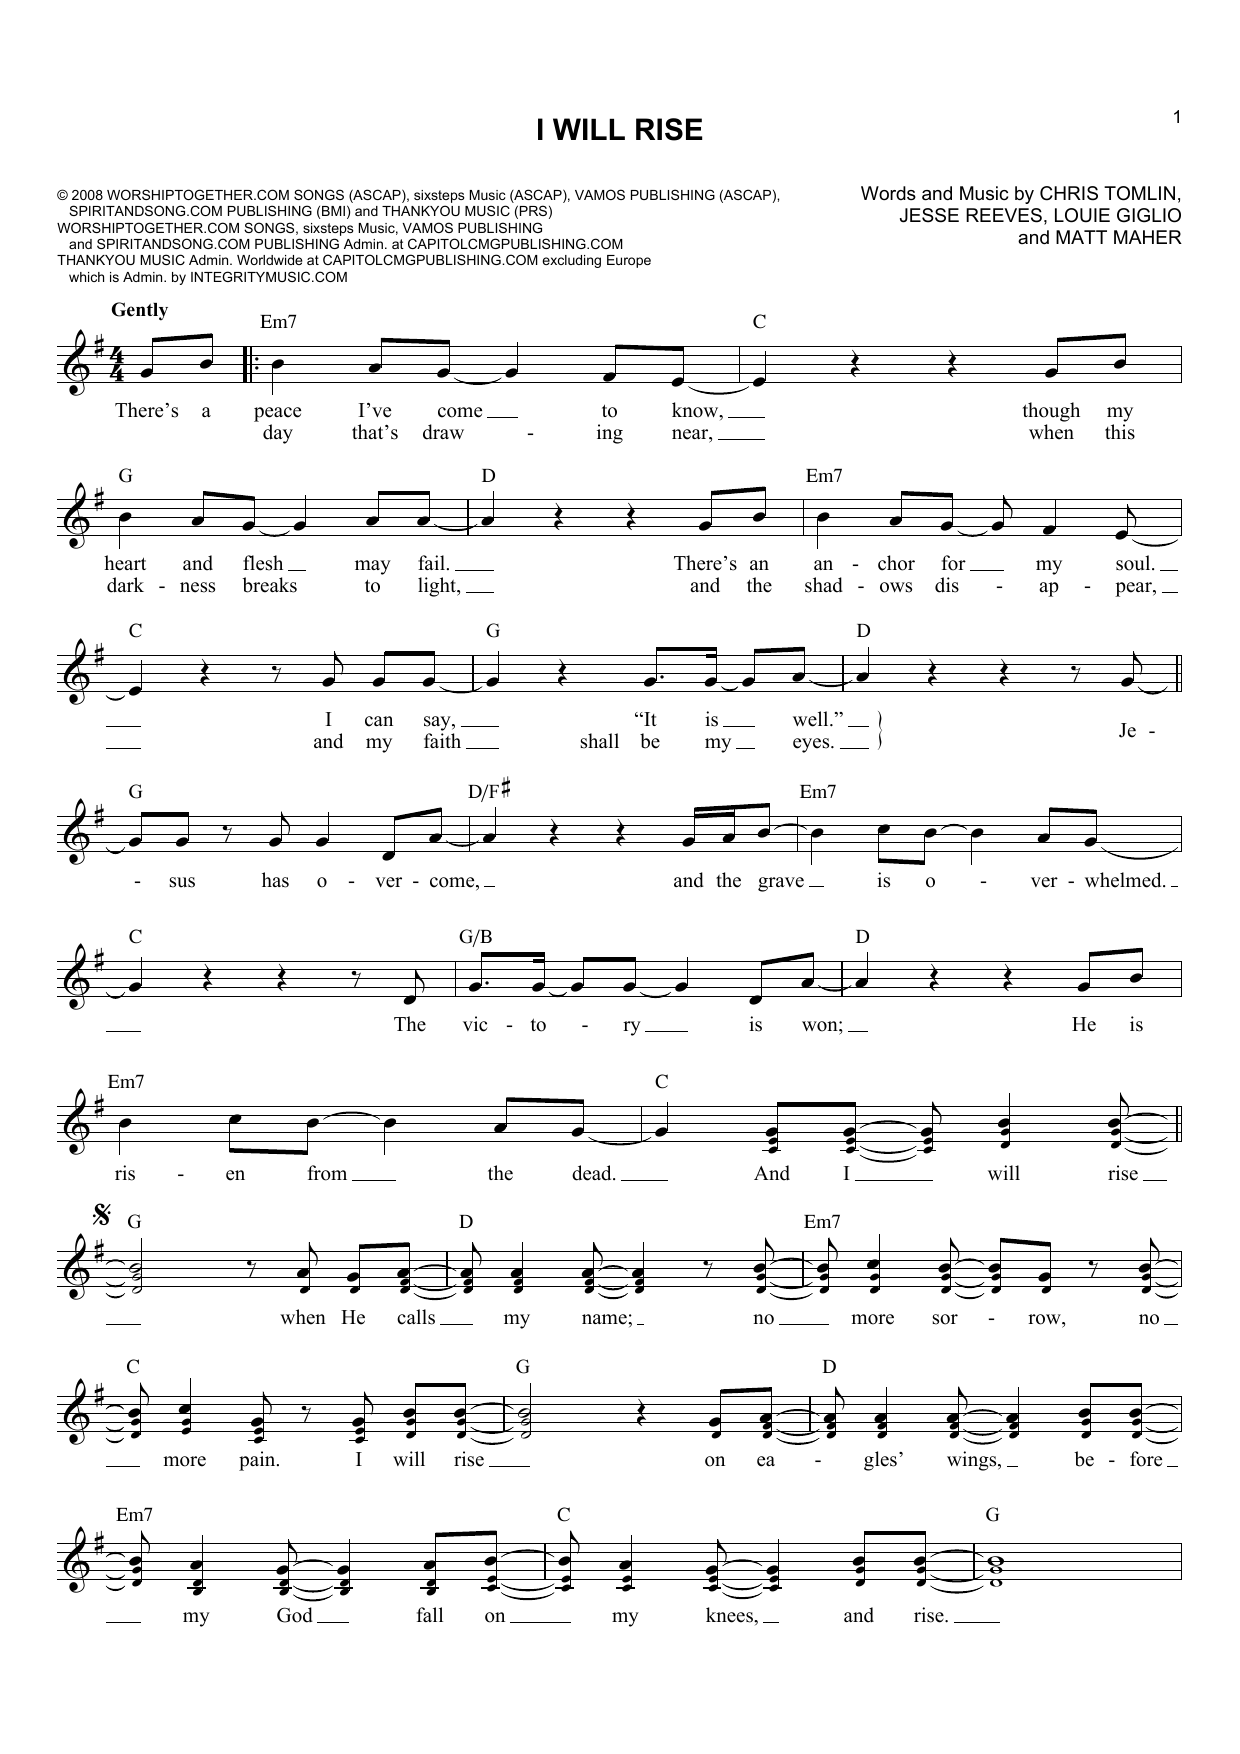 Chris Tomlin I Will Rise Sheet Music Notes Chords Printable